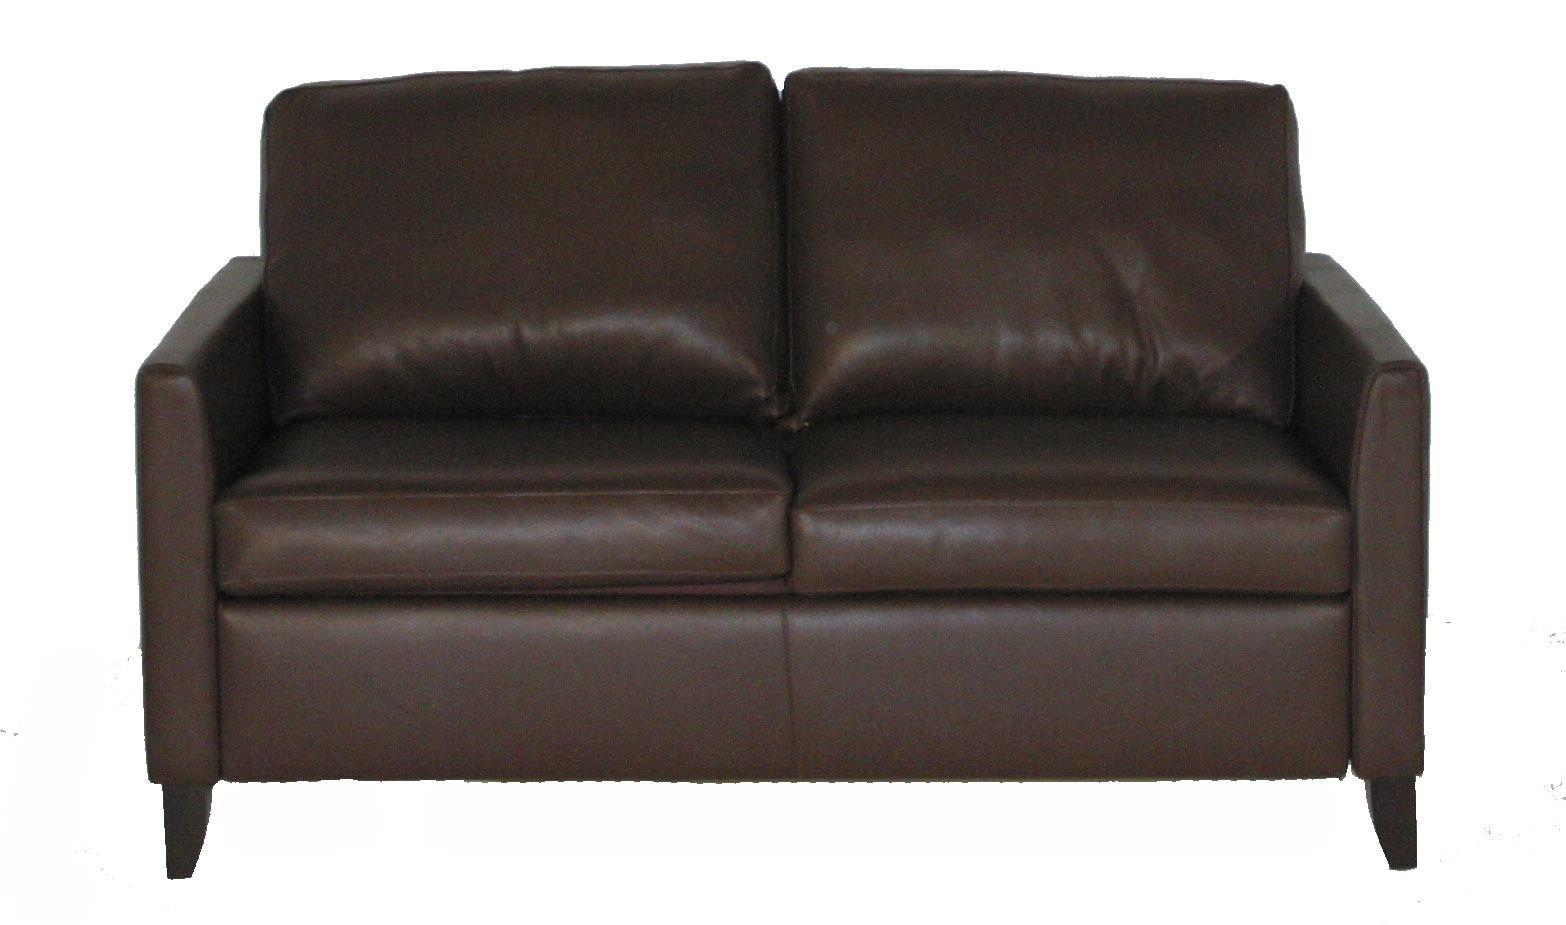 american leather comfort sleeper hannah full sofa sleeper baeru0027s furniture sleeper sofas